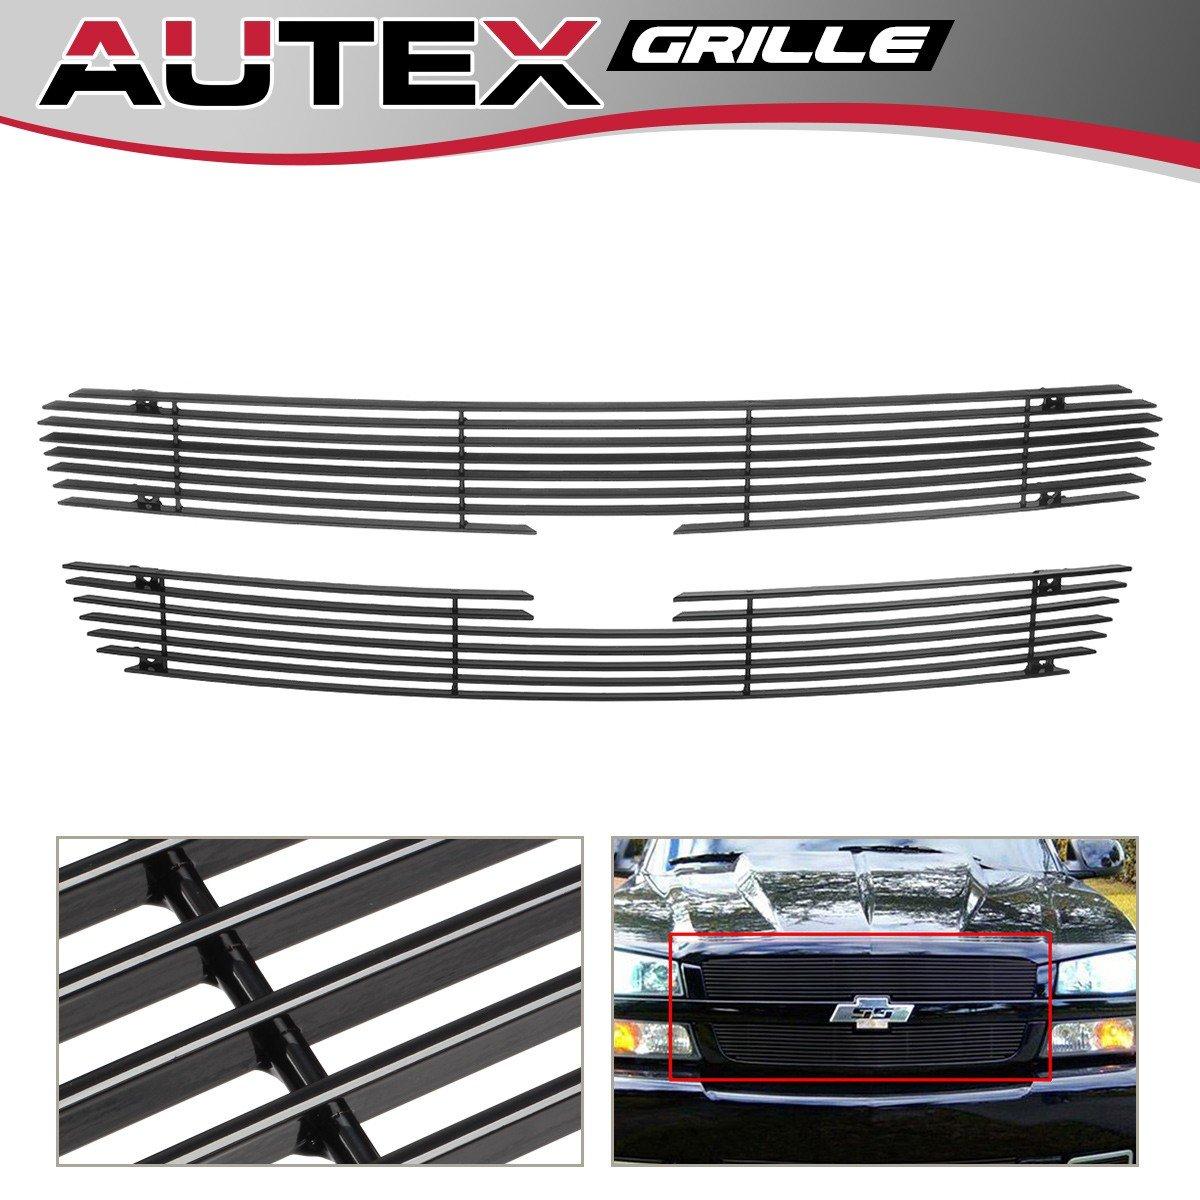 AUTEX C65717H Black Horizontal Upper Billet Grille Insert for 2003-2005 Chevy Silverado 1500/1500 SS/1500 HD, 2003-2004 Chevy Silverado 2500/3500/2500 HD, 2002-2006 Chevy Avalanche 1500/2500 Grill